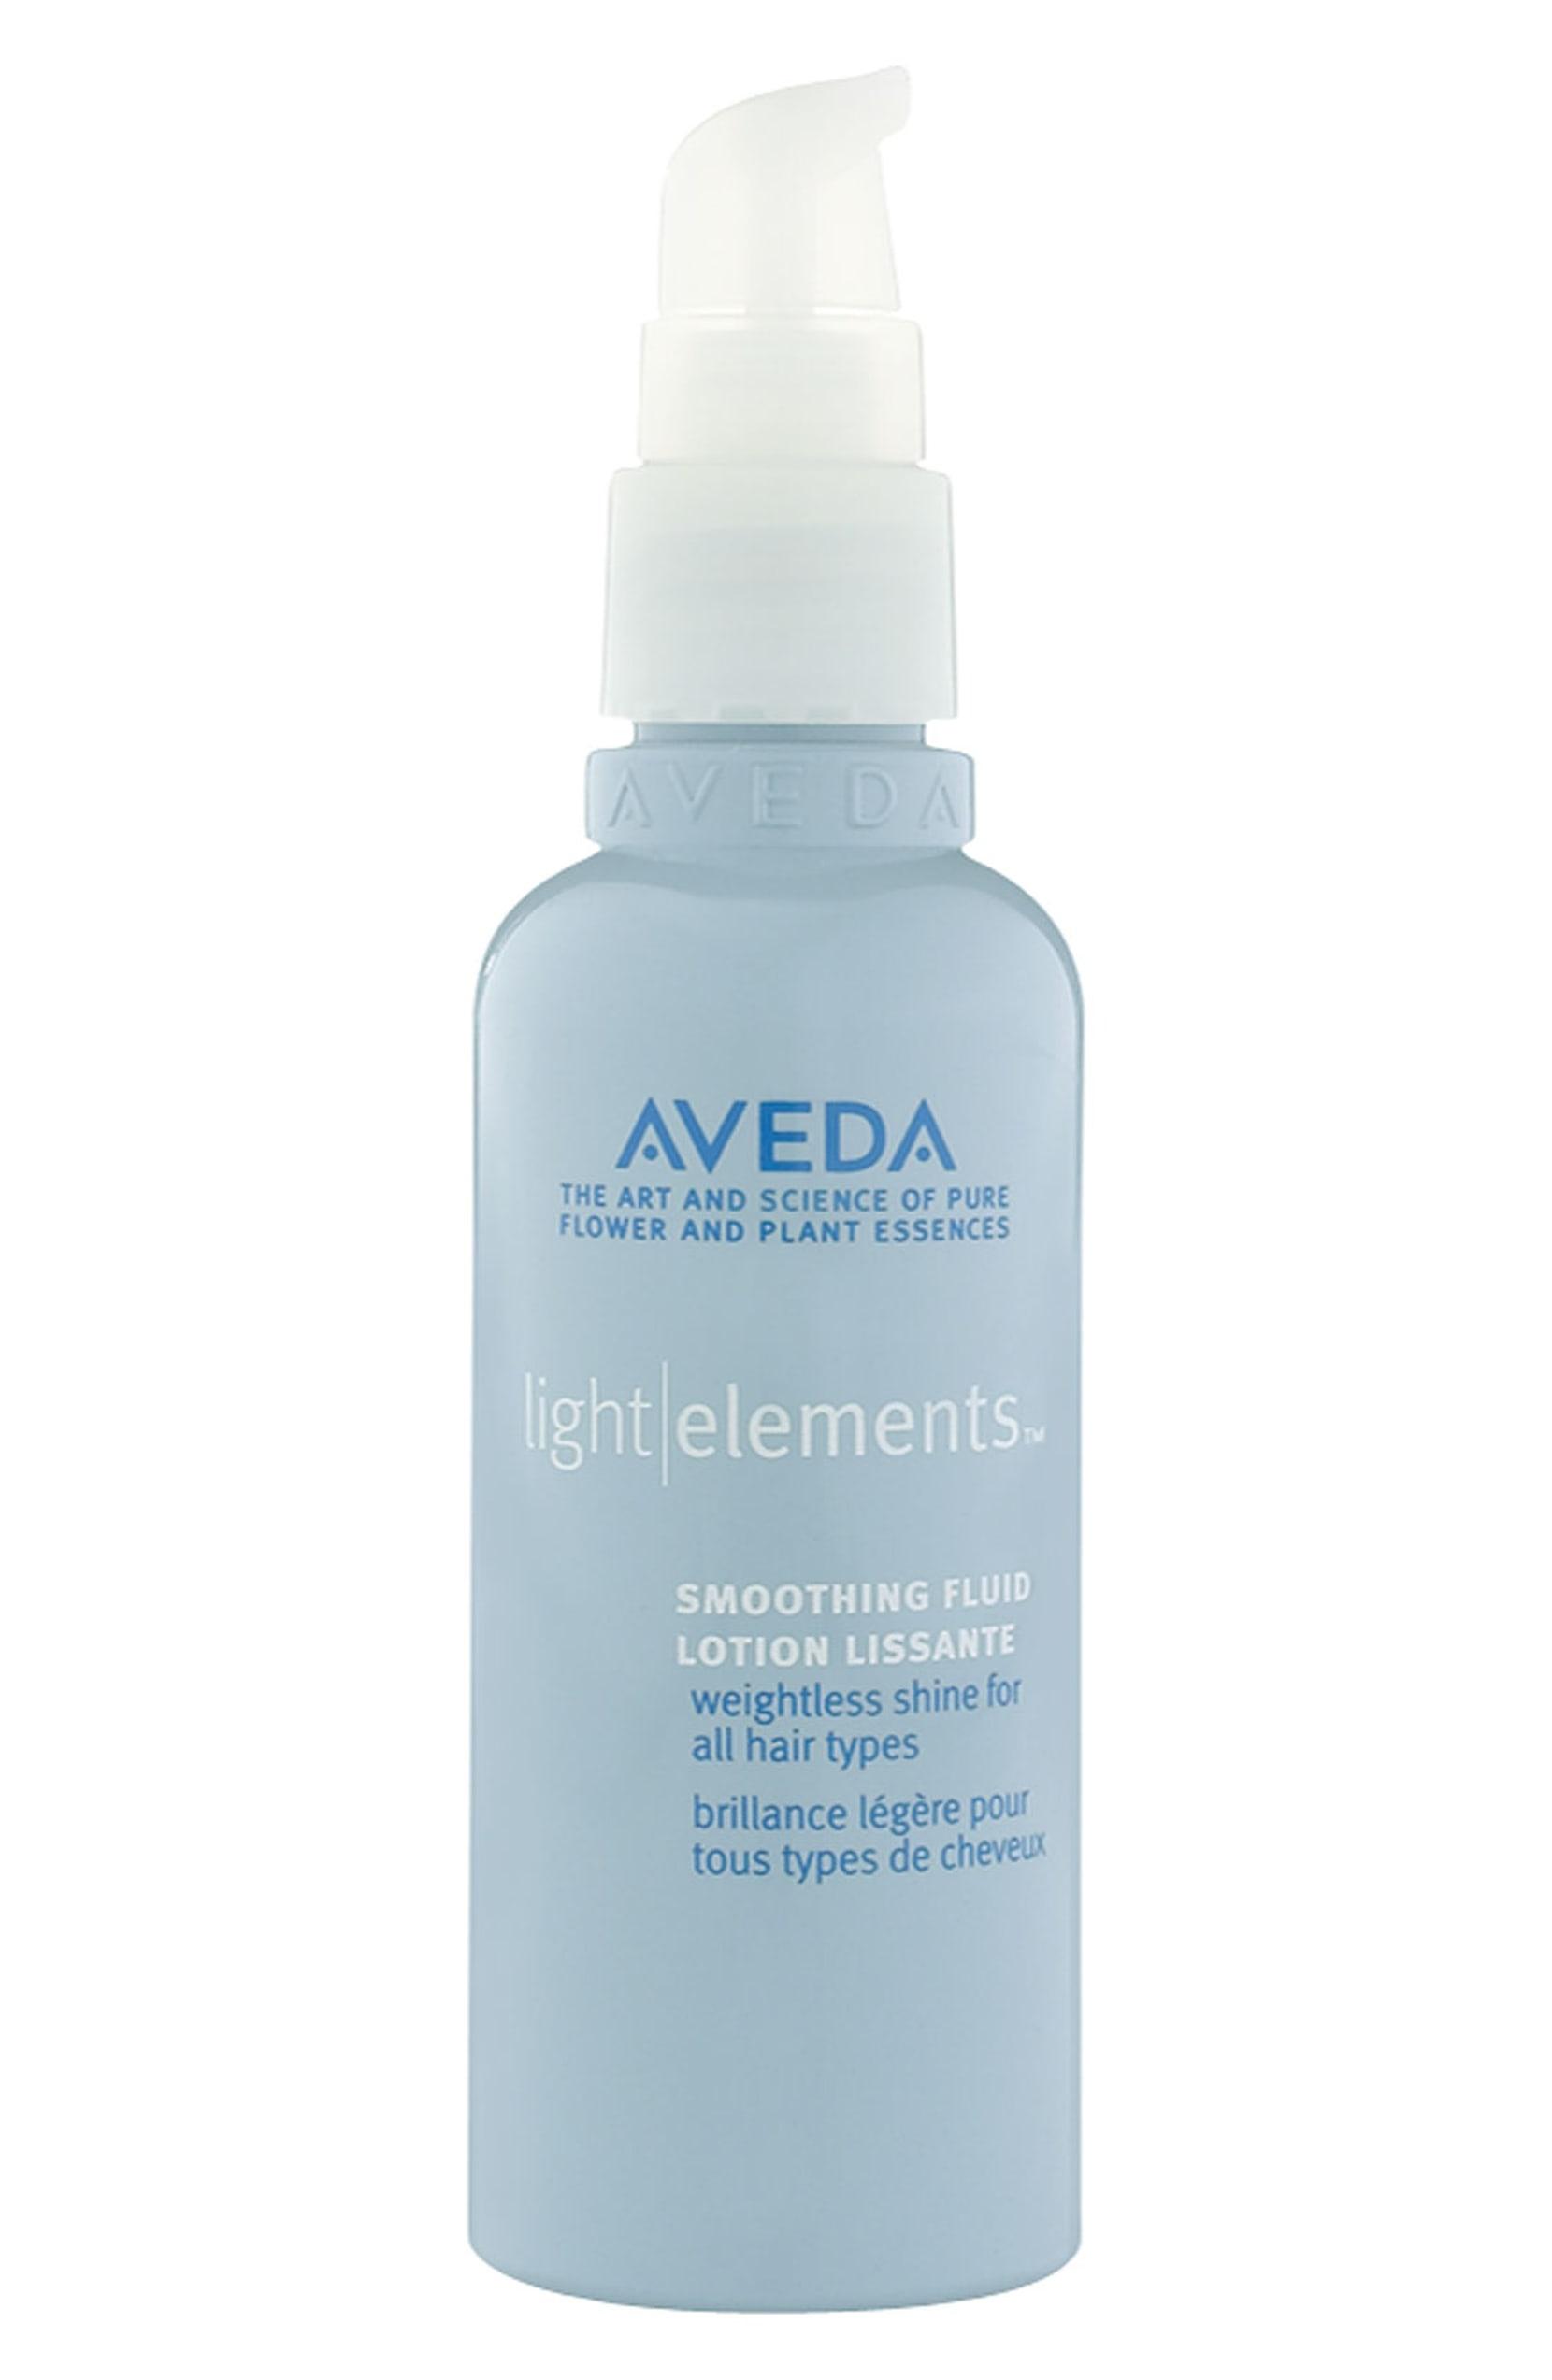 Aveda Light Elements™ Smoothing Fluid